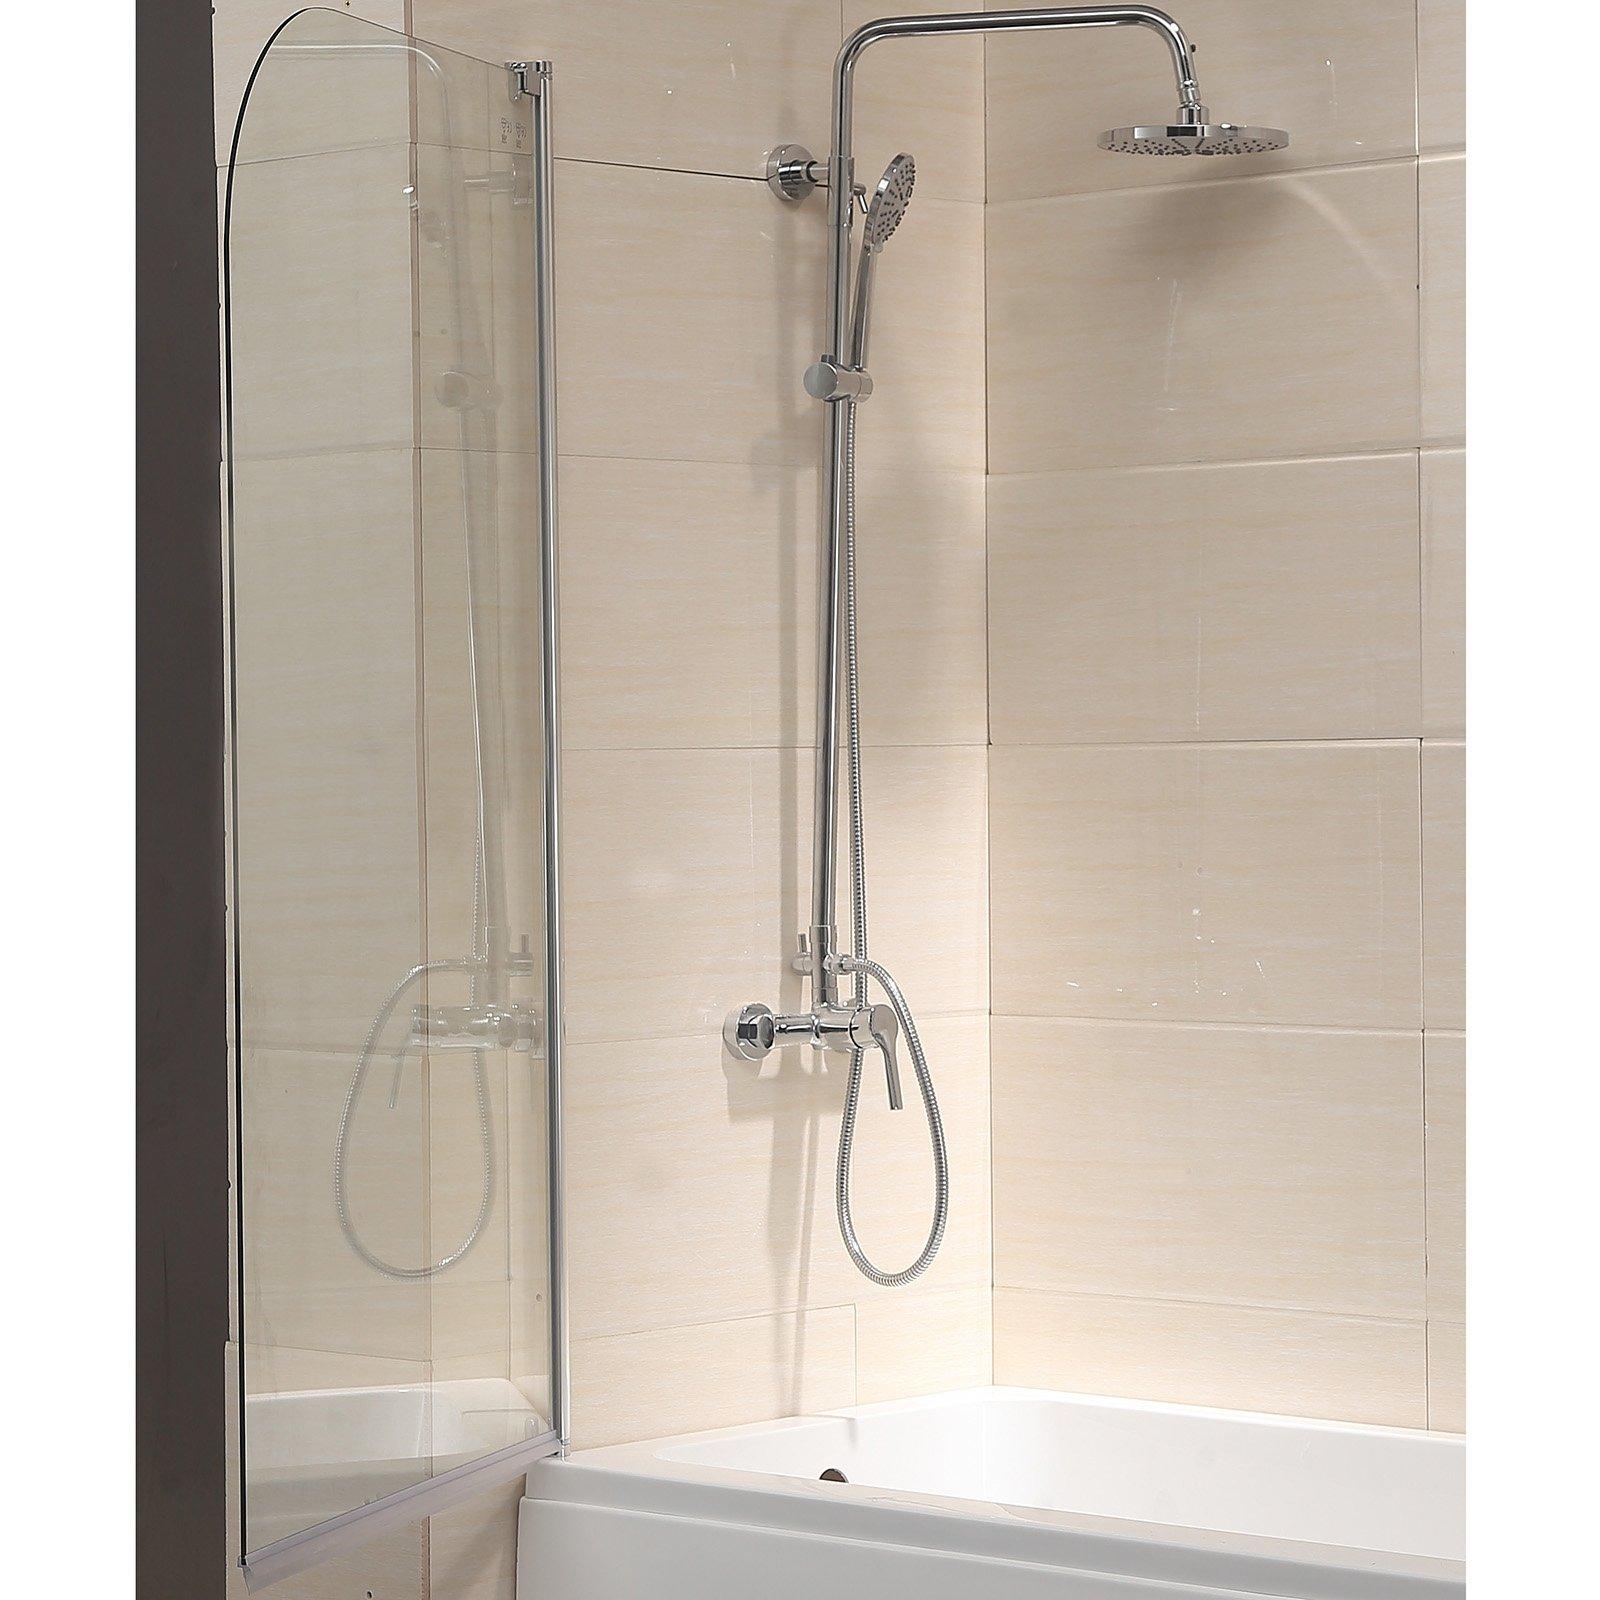 Mecor 55''X31'' Bathtub Shower Door 1/4'' Clear Glass Hinged Pivot Radius Frameless Chrome Finish by mecor (Image #2)